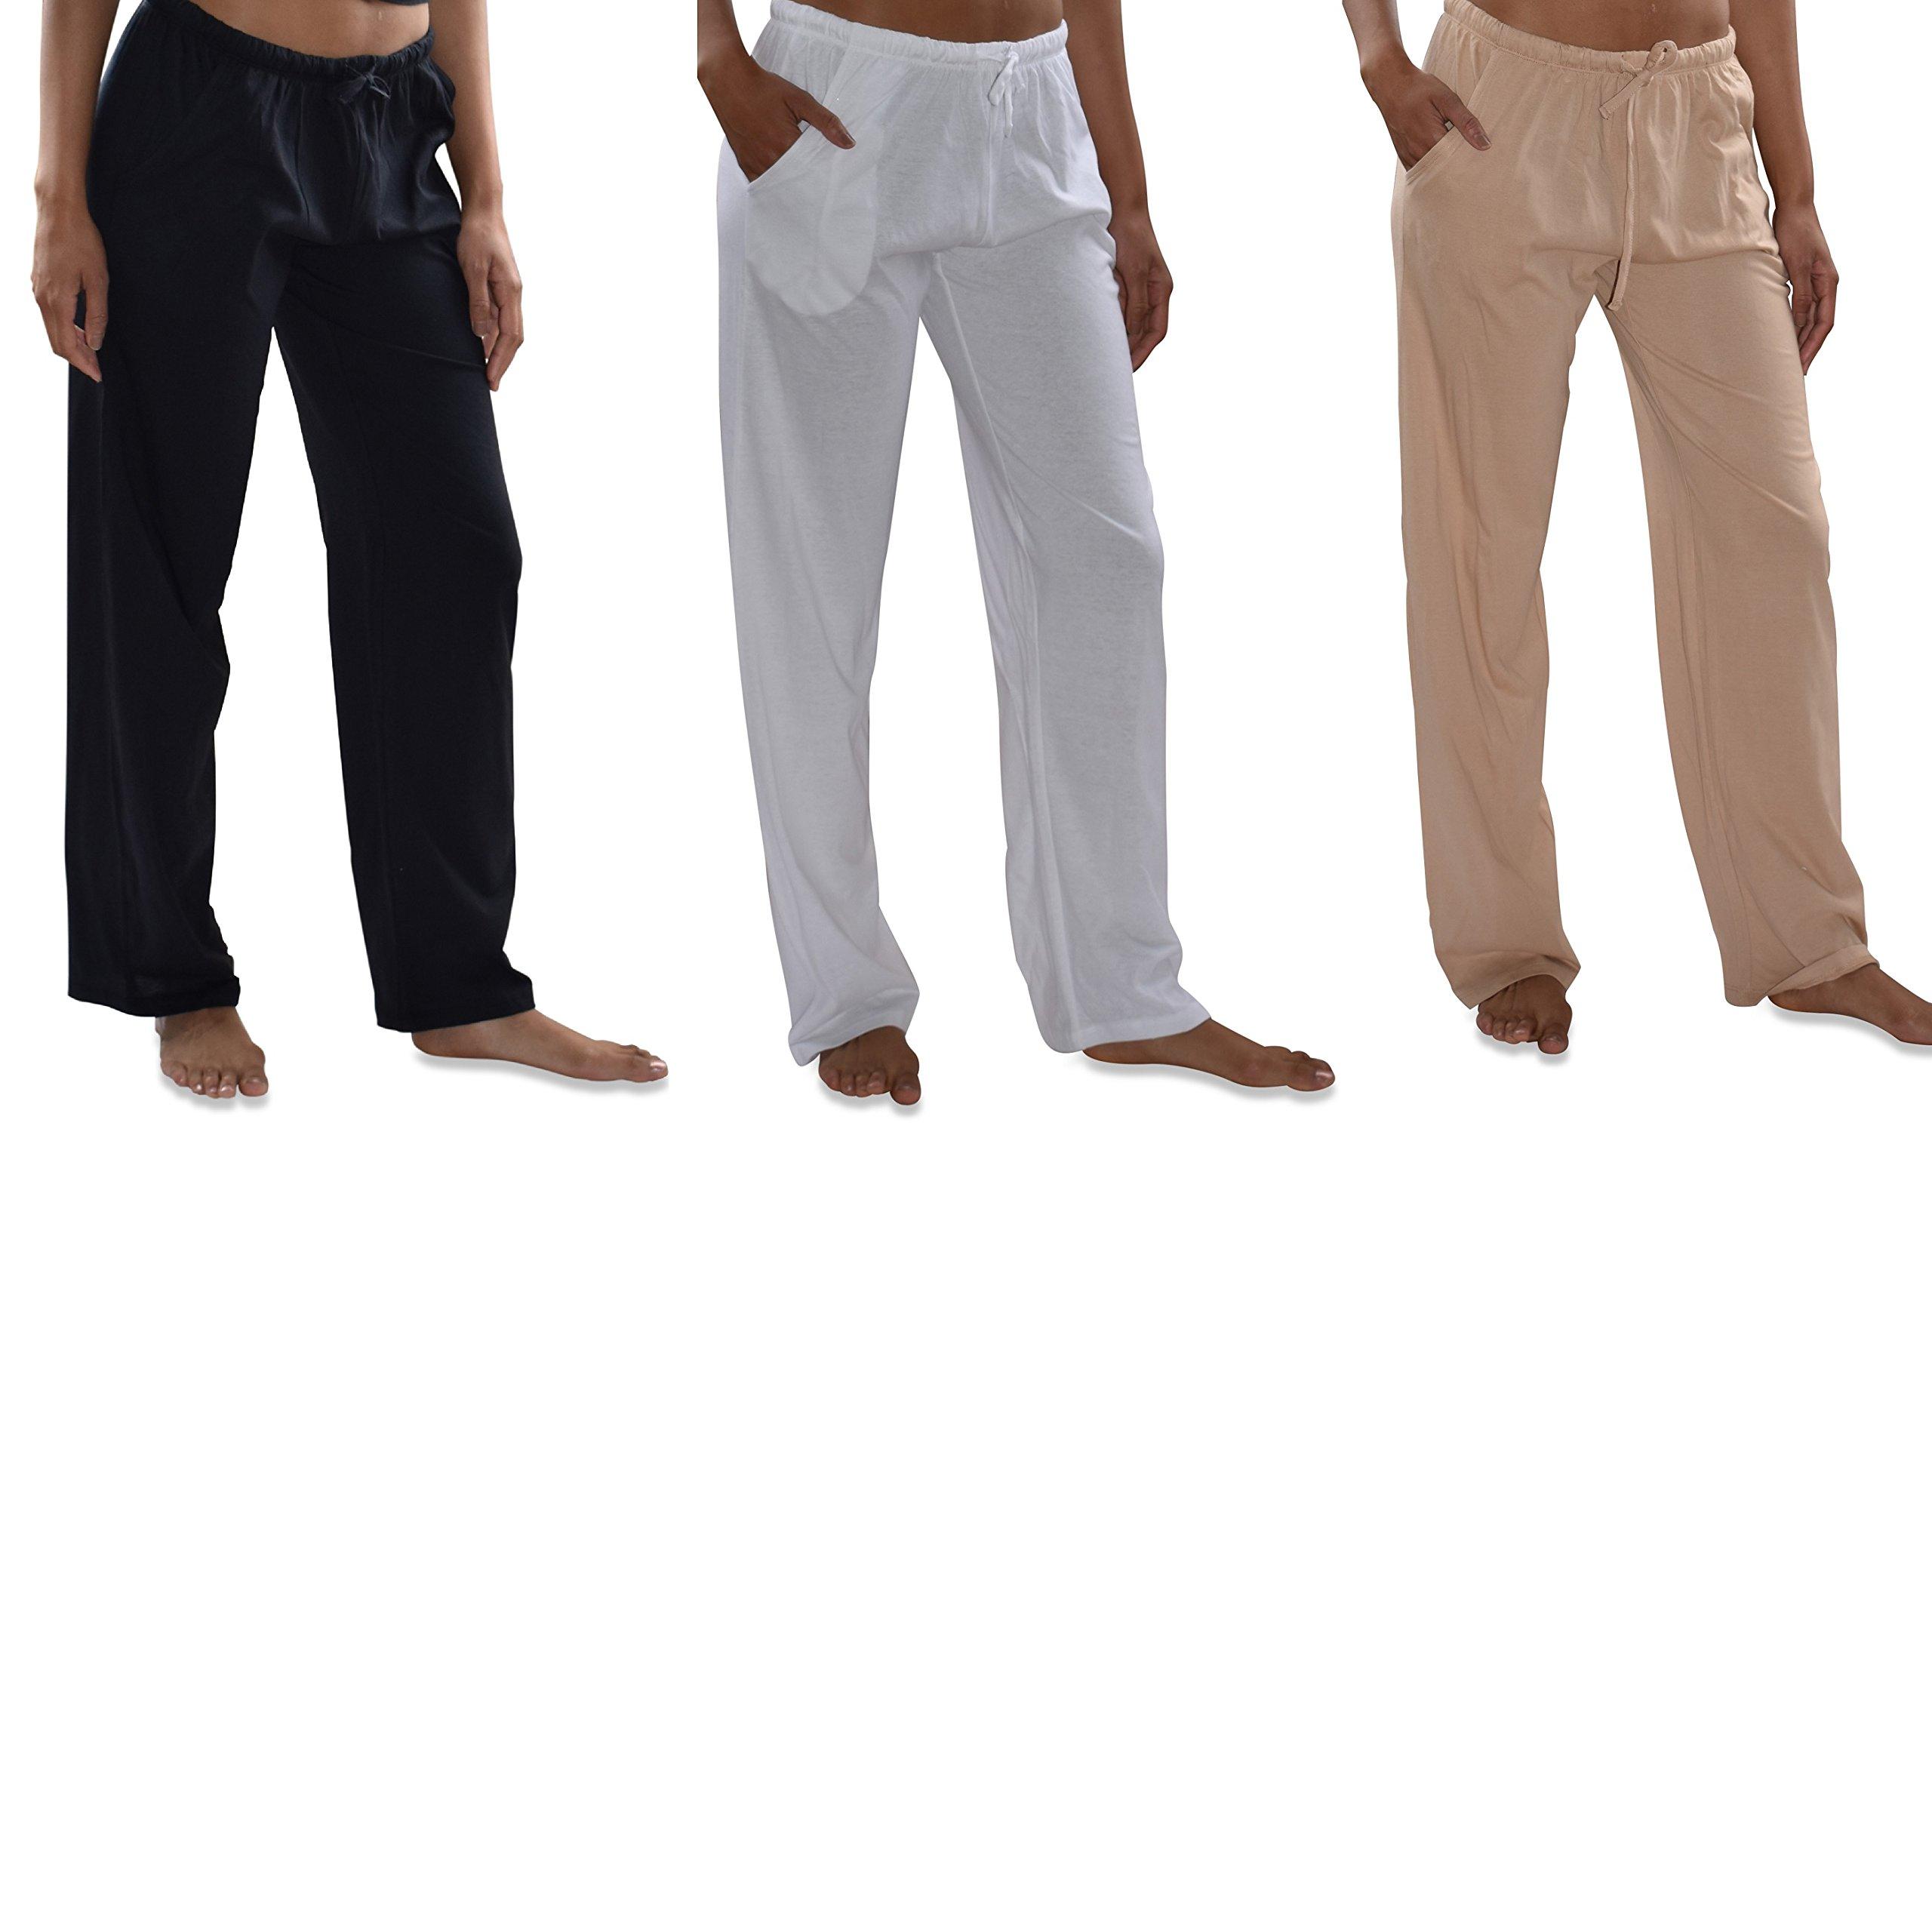 Sexy Basics Women's 3 Pack Soft Flex-Cotton Knit Pajama Pants/Lounge Pants/Sleep Pants (3 Pack-Black/White/Khaki, XX-Large)